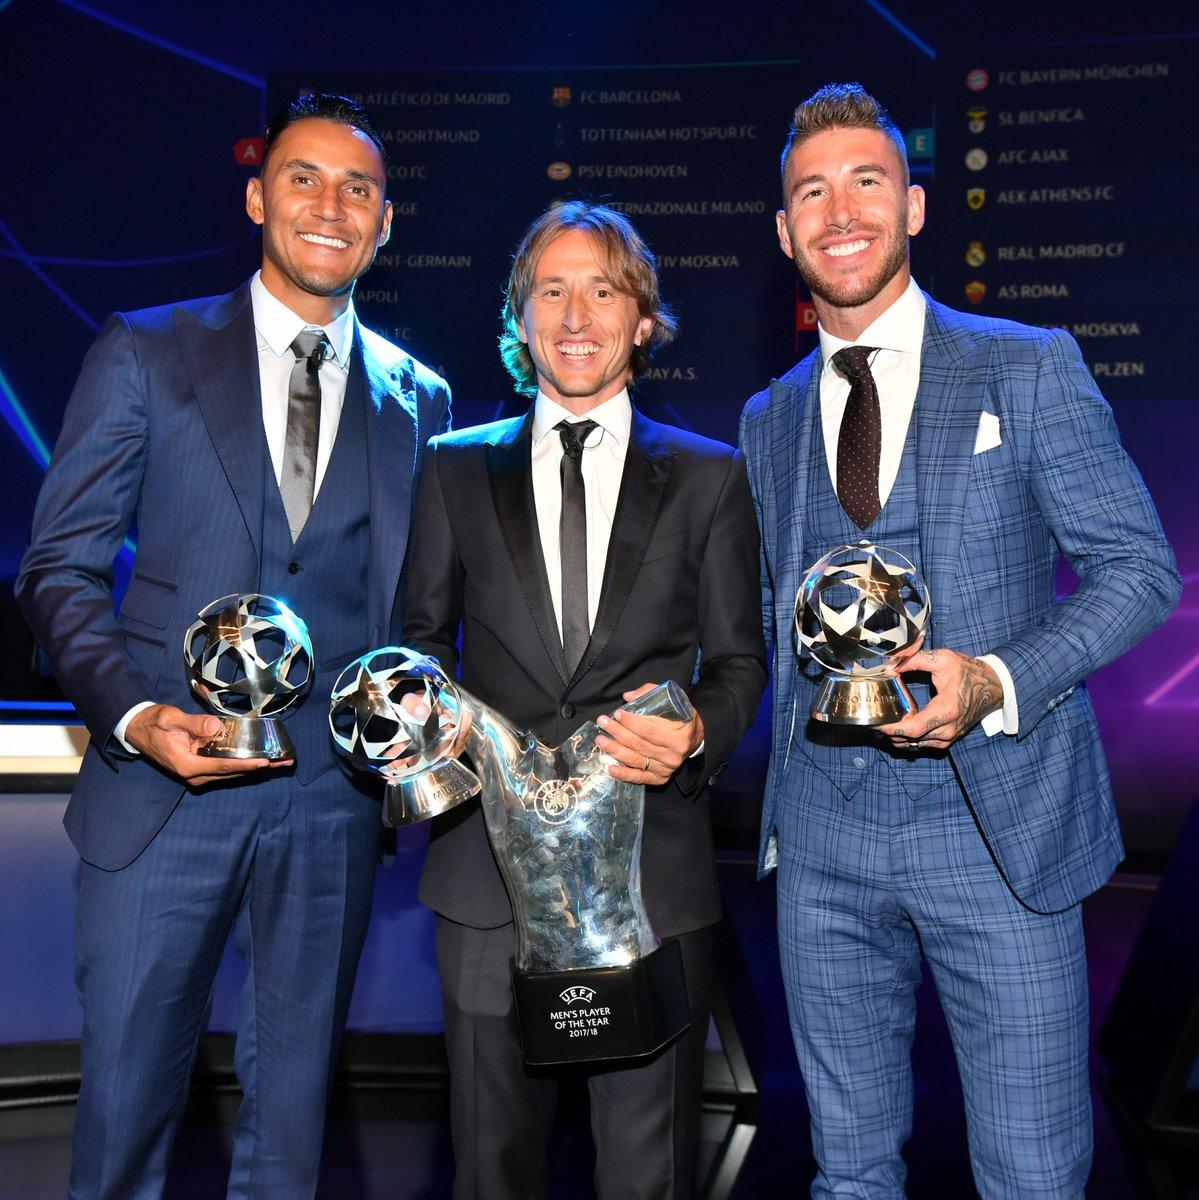 Luka Modric Bags UEFA 'Player of the Year' Award